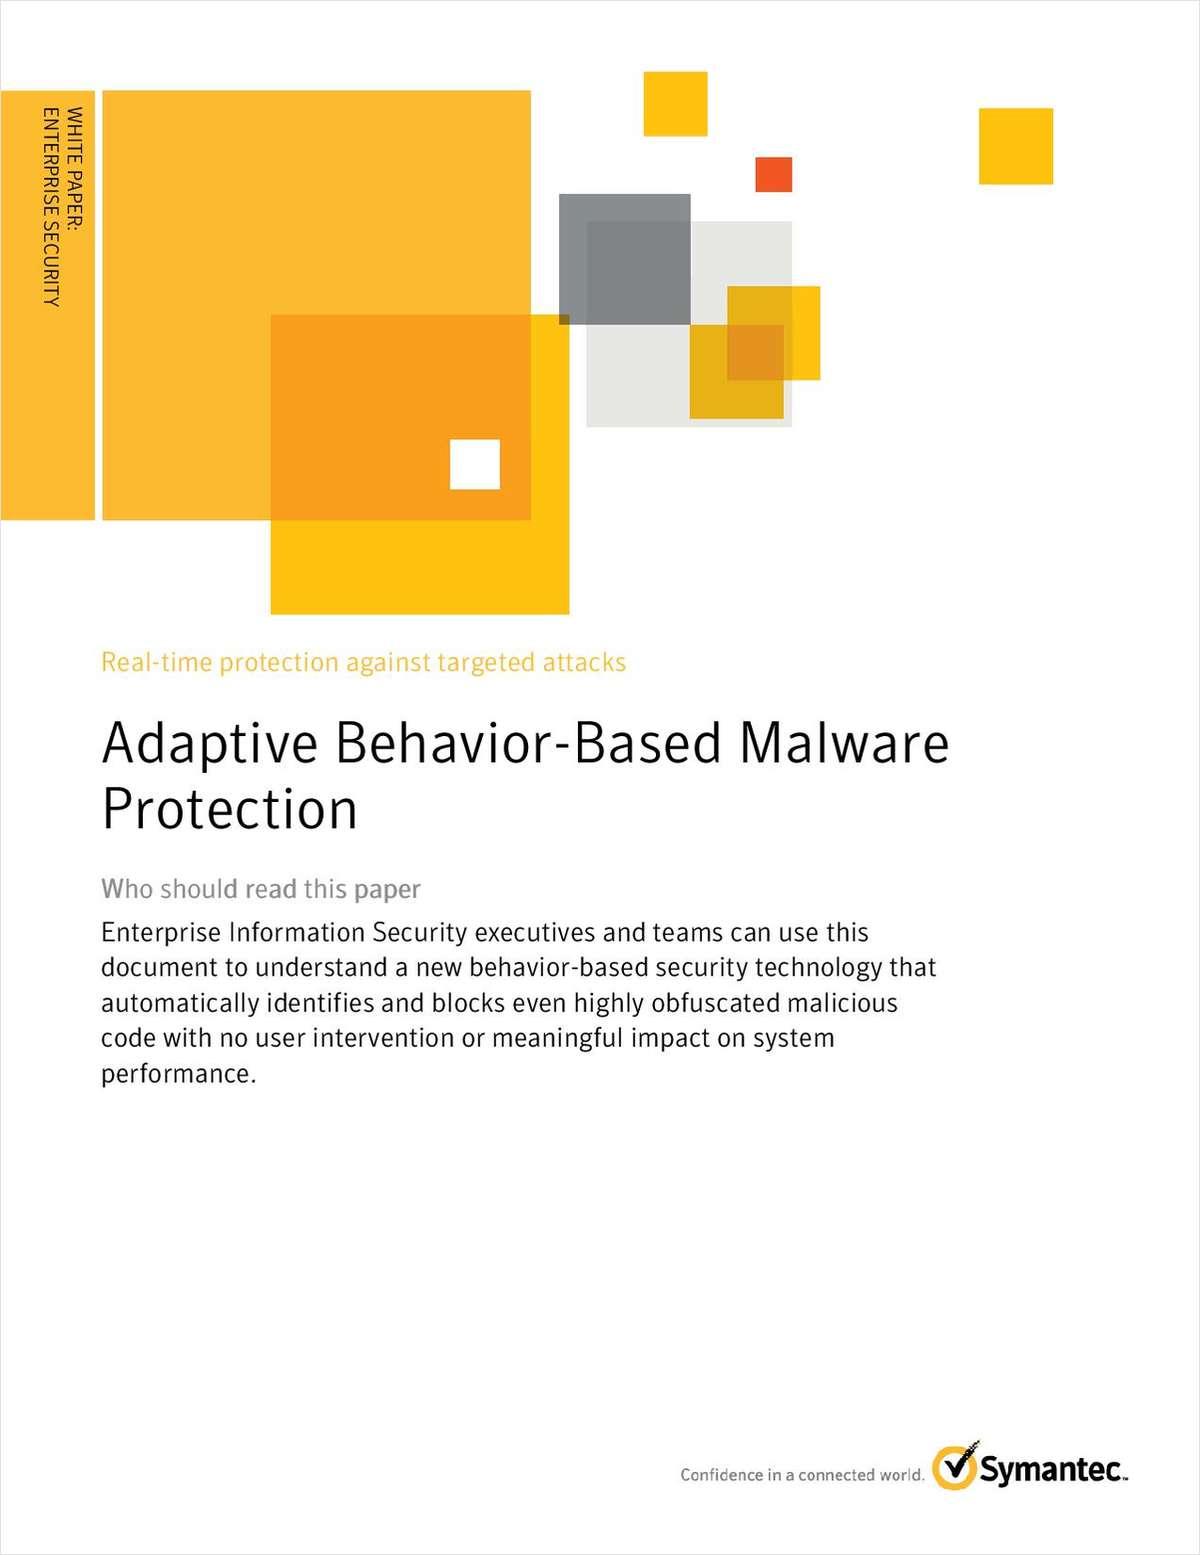 Adaptive Behavior-Based Malware Protection